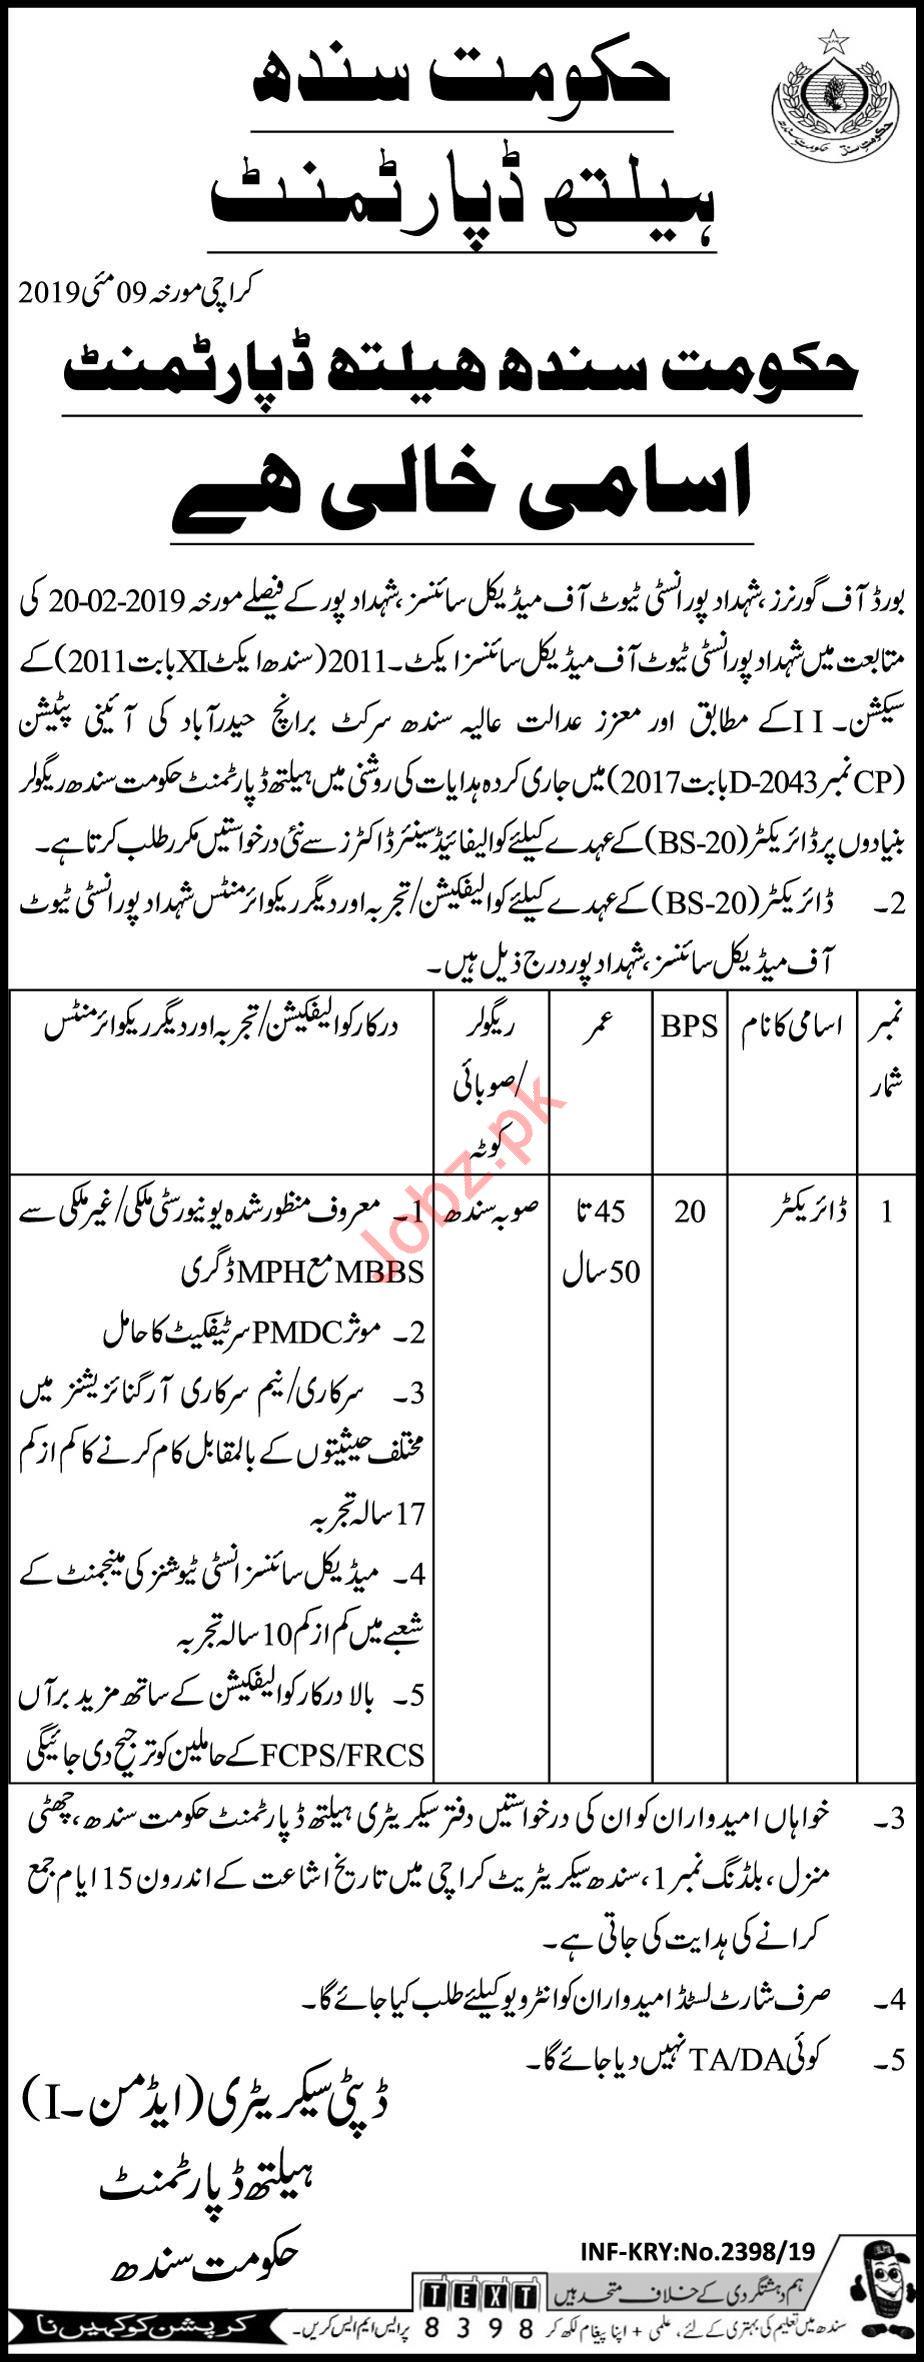 Sindh Health Department Medical Staff Jobs 2019